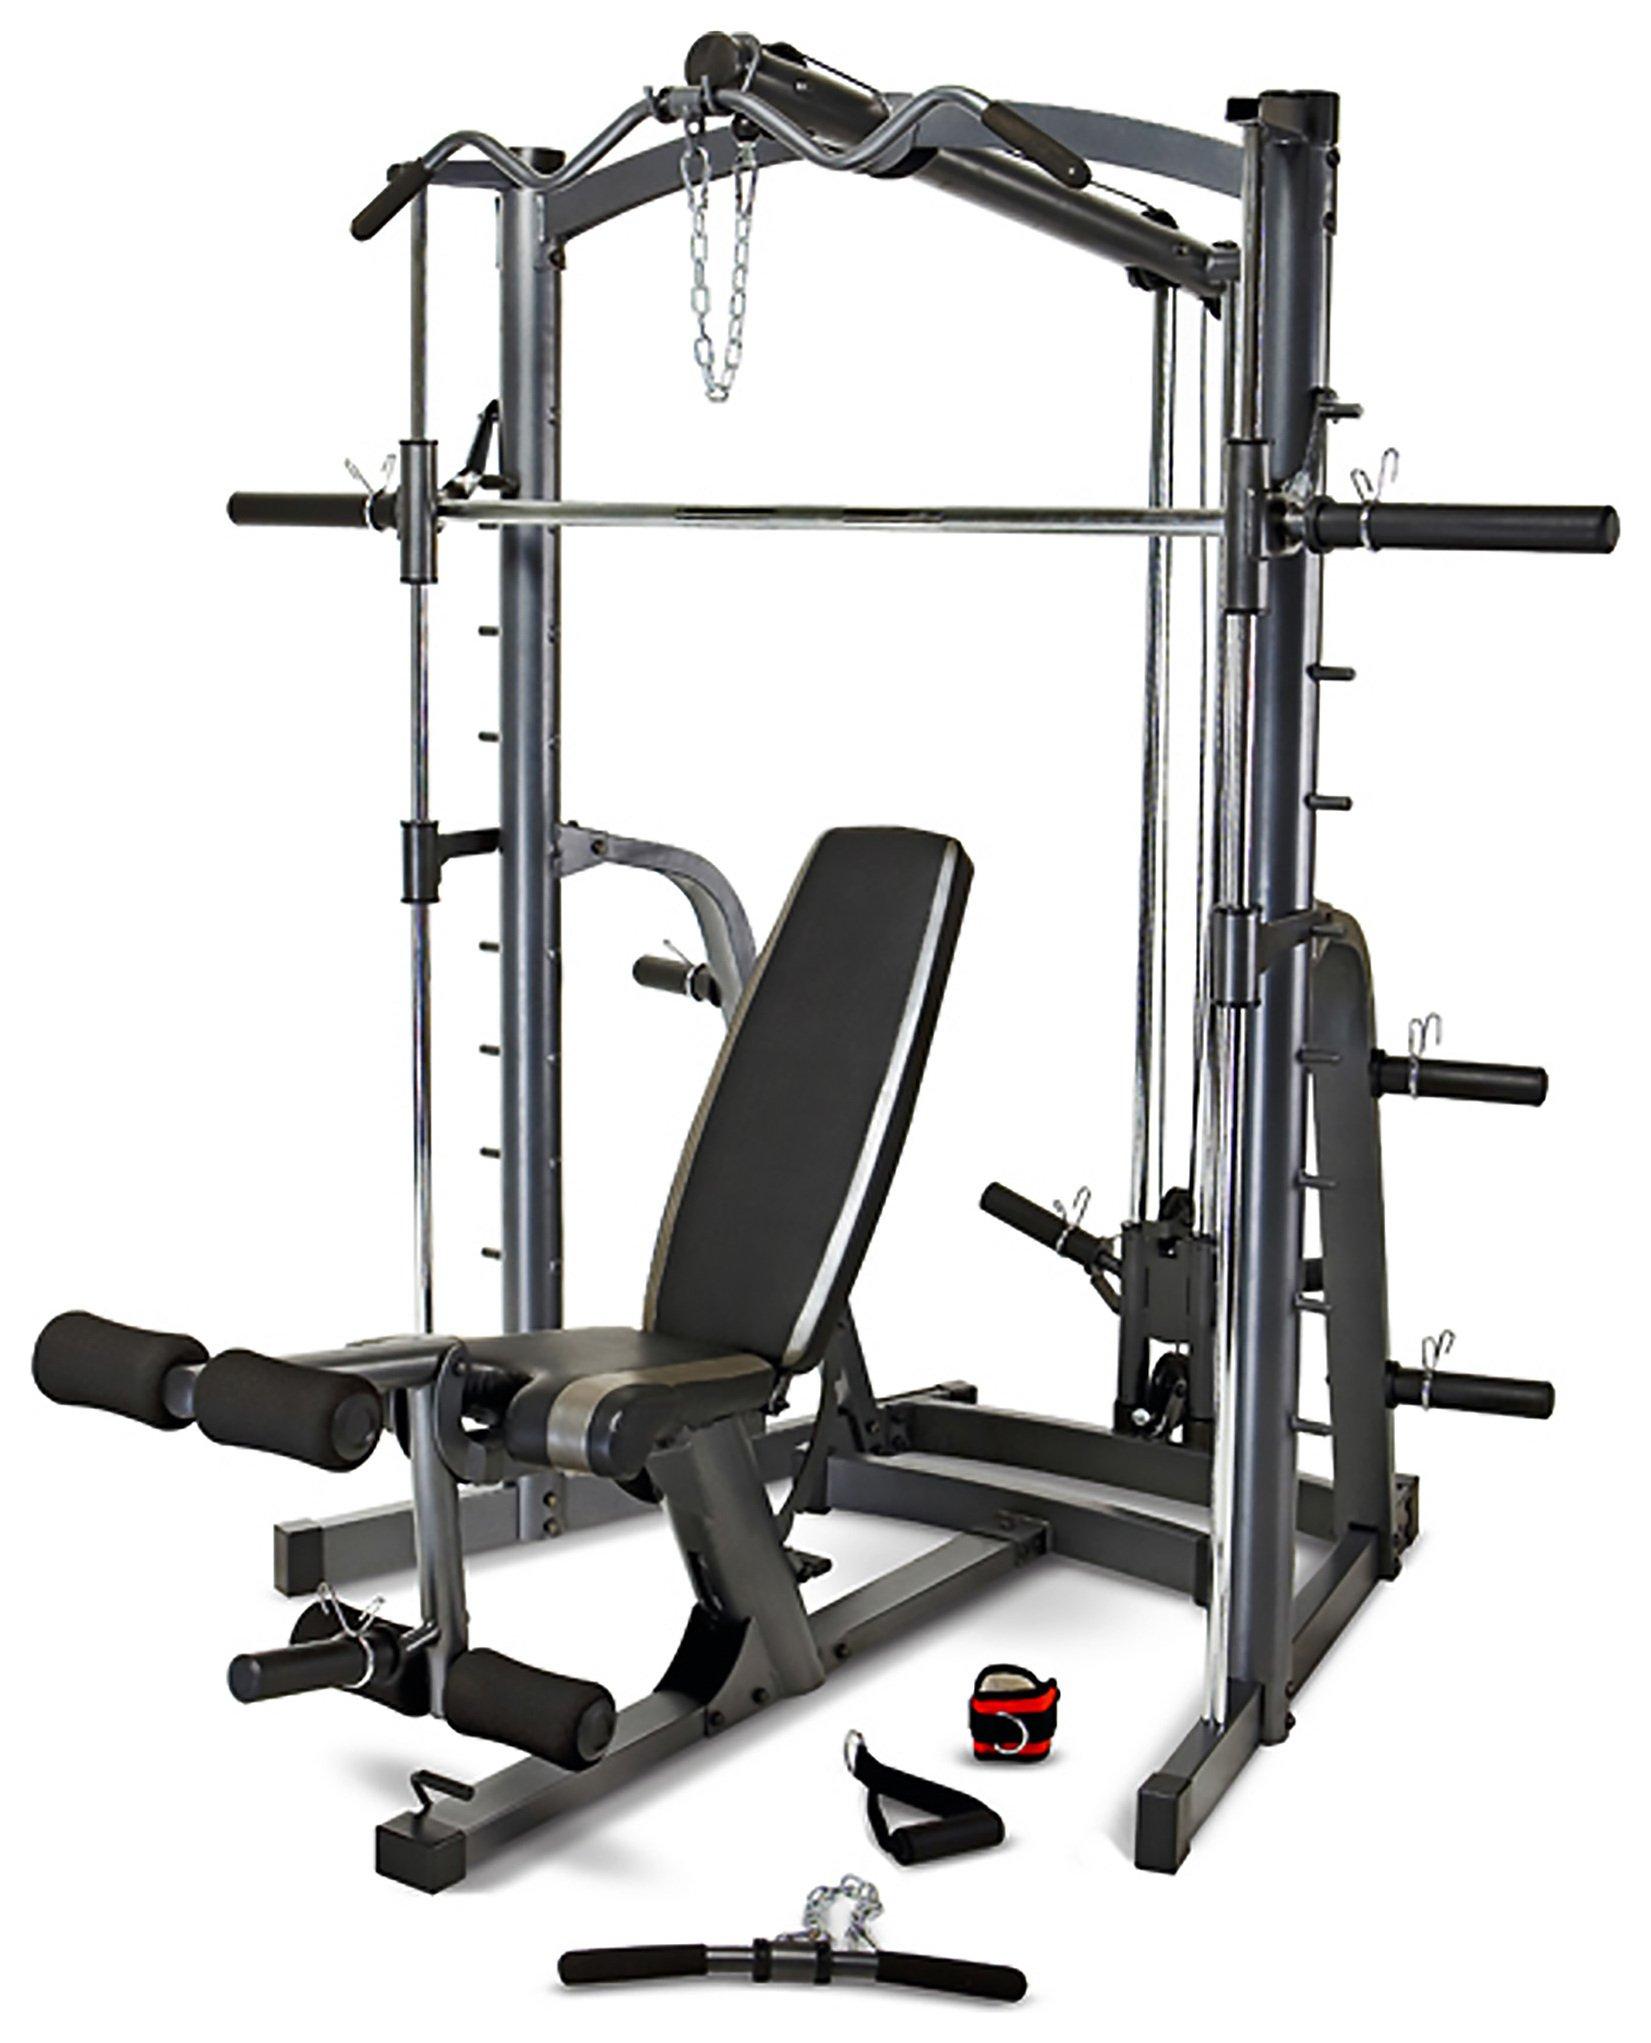 Marcy mwb home multi gym smith machine argos price